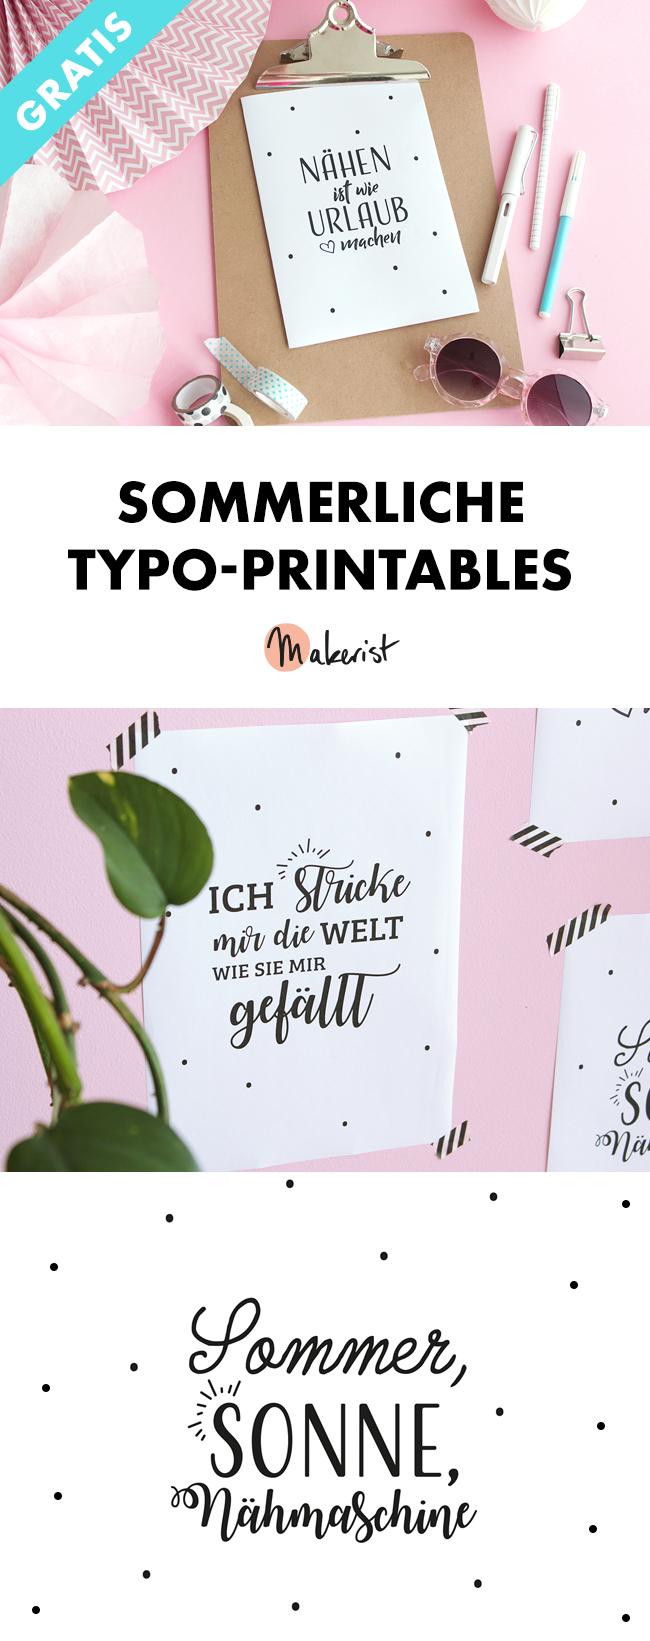 01 sommerliche typo printables